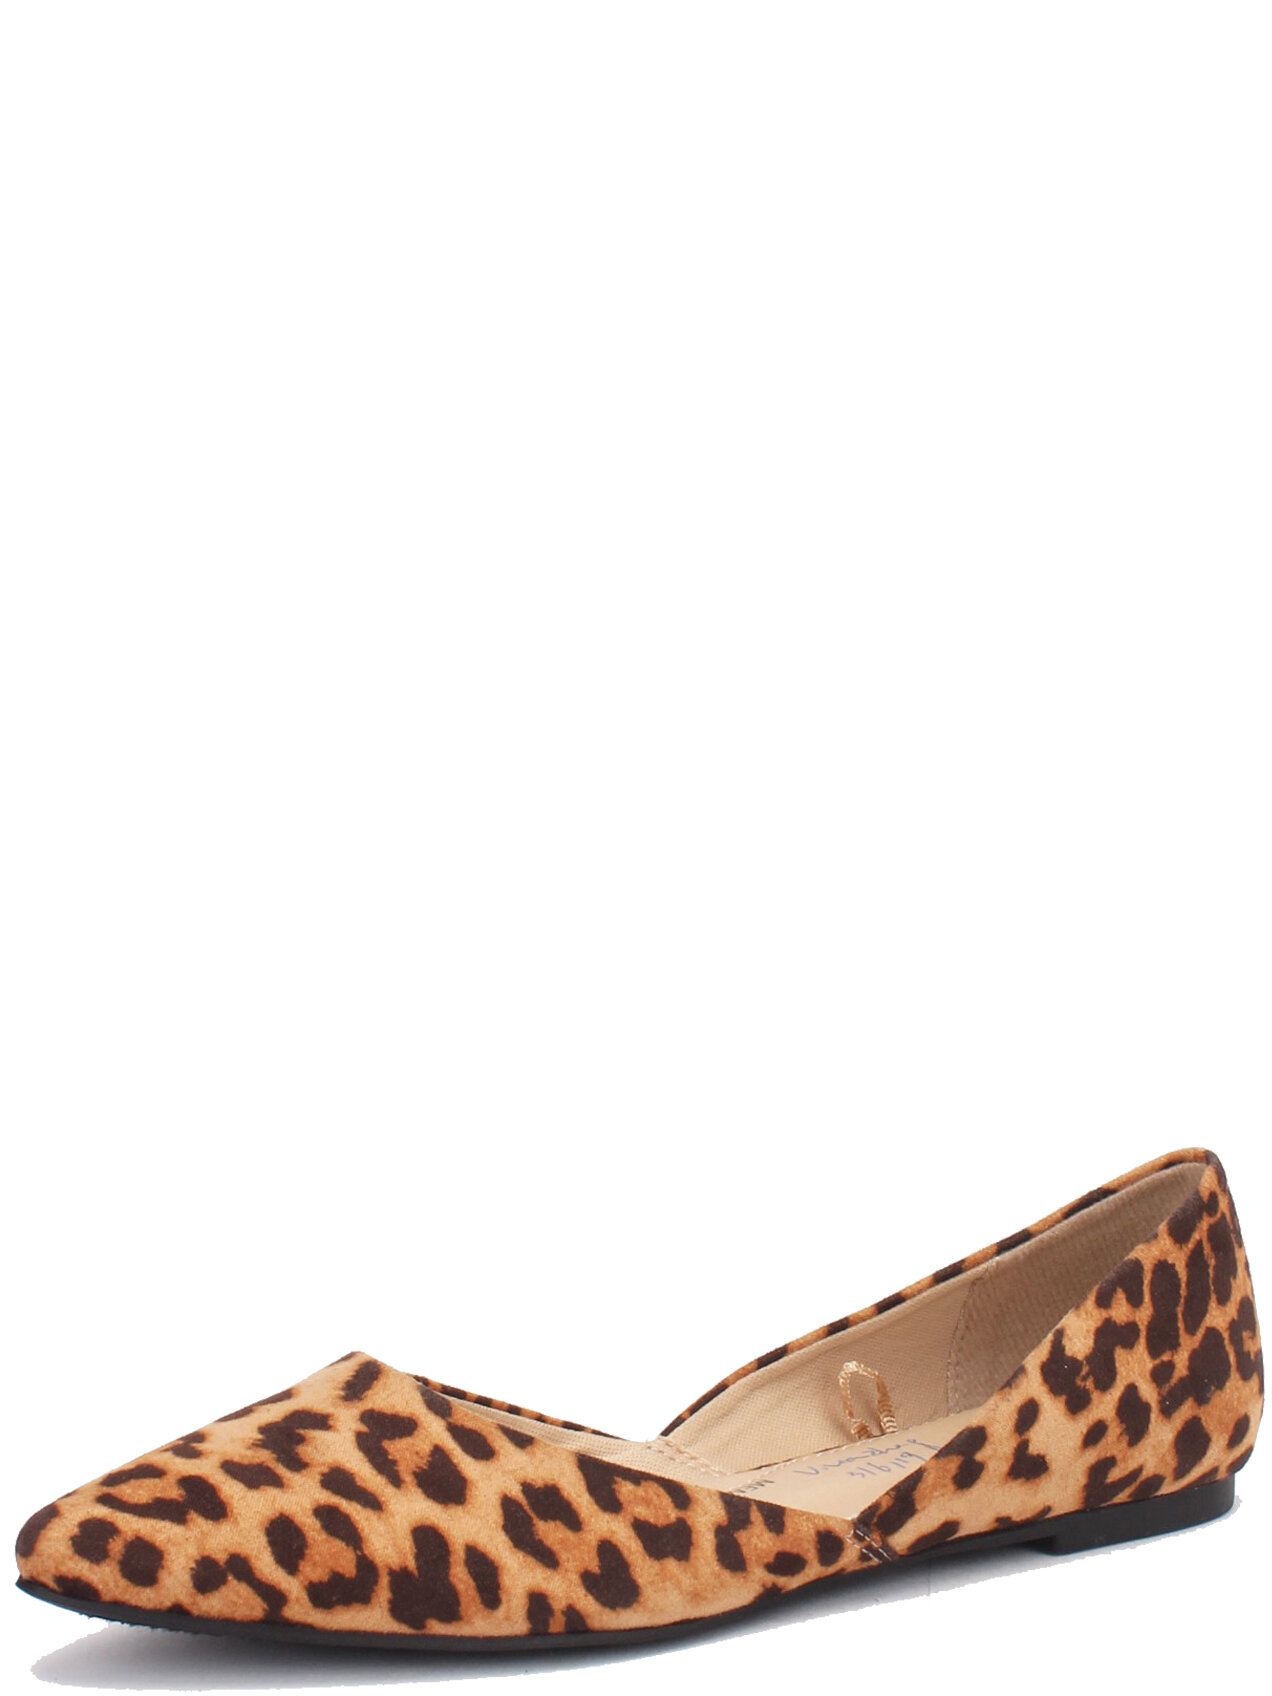 LeopardFlatsWalmart.jpg